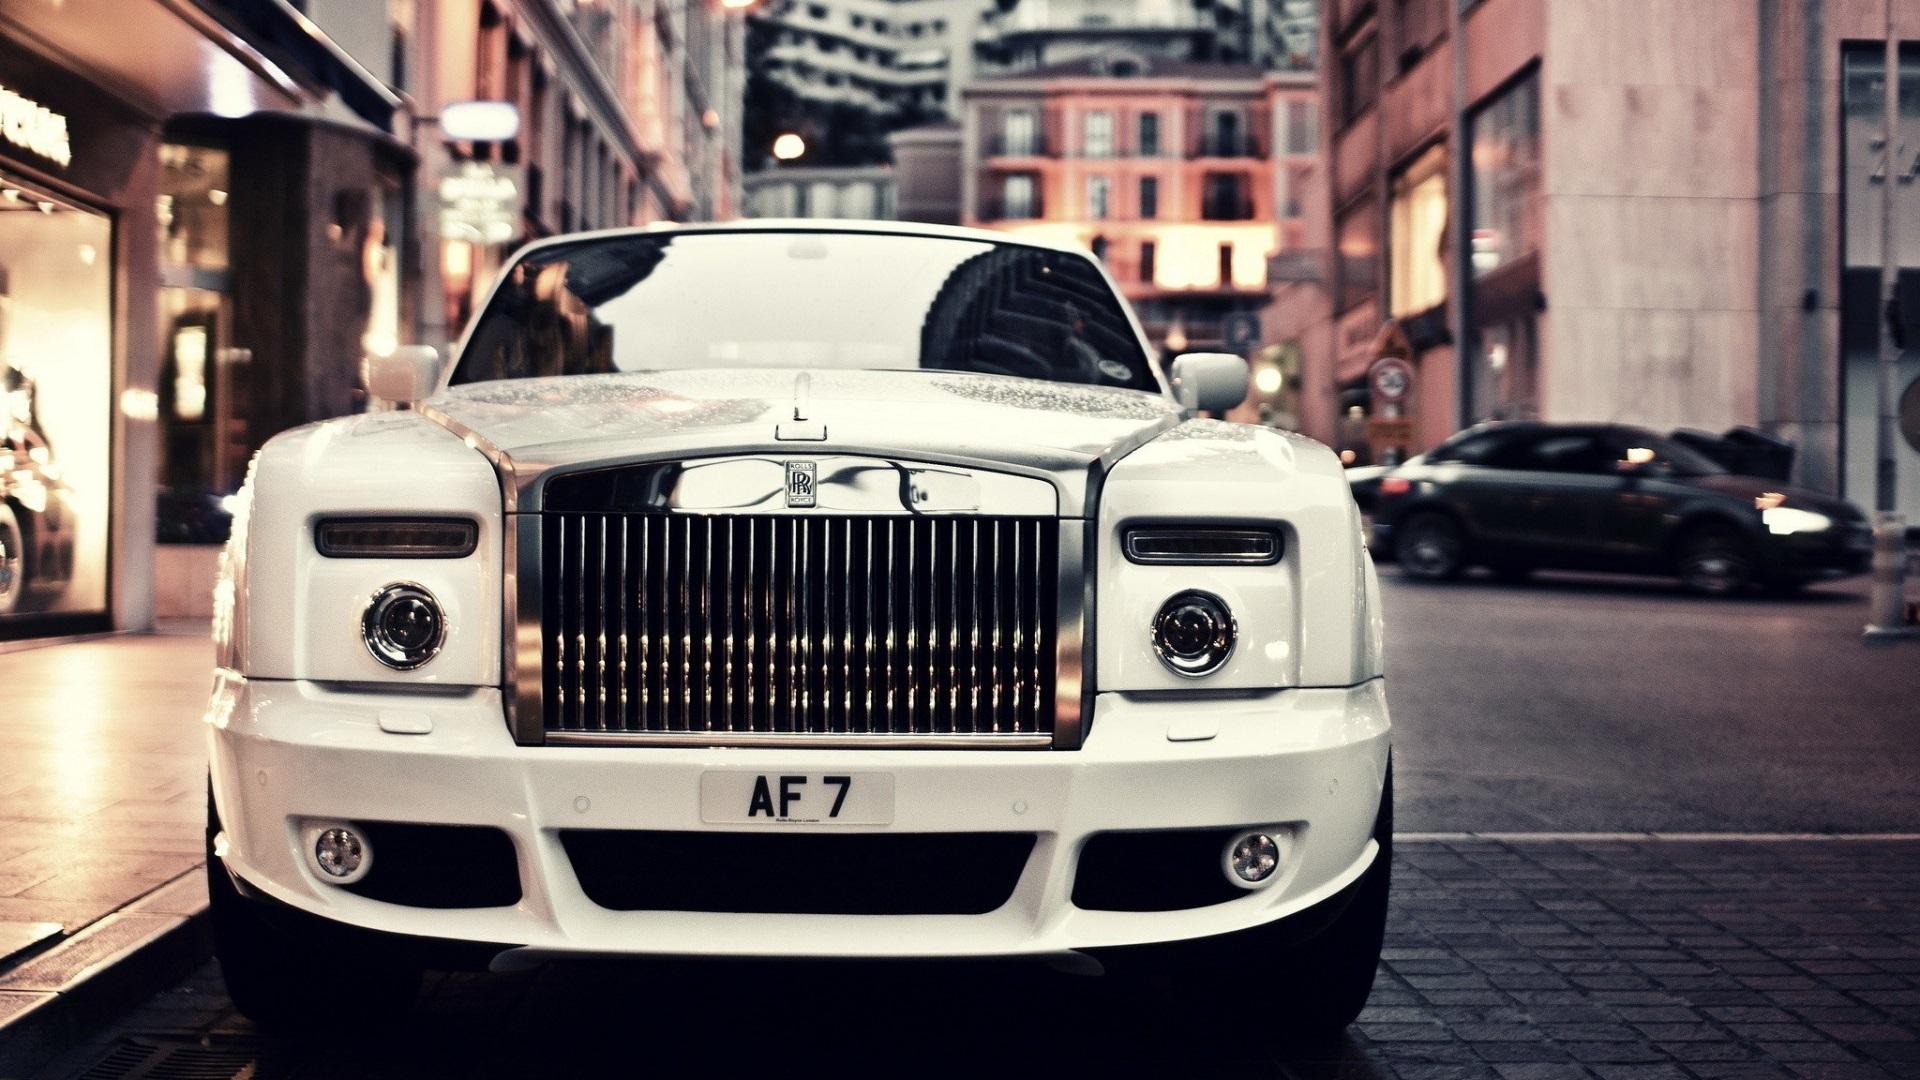 16 Luxury Pubg Wallpaper Iphone 6: 壁紙 ロールスロイスファントム白い車の正面図 1920x1200 HD 無料